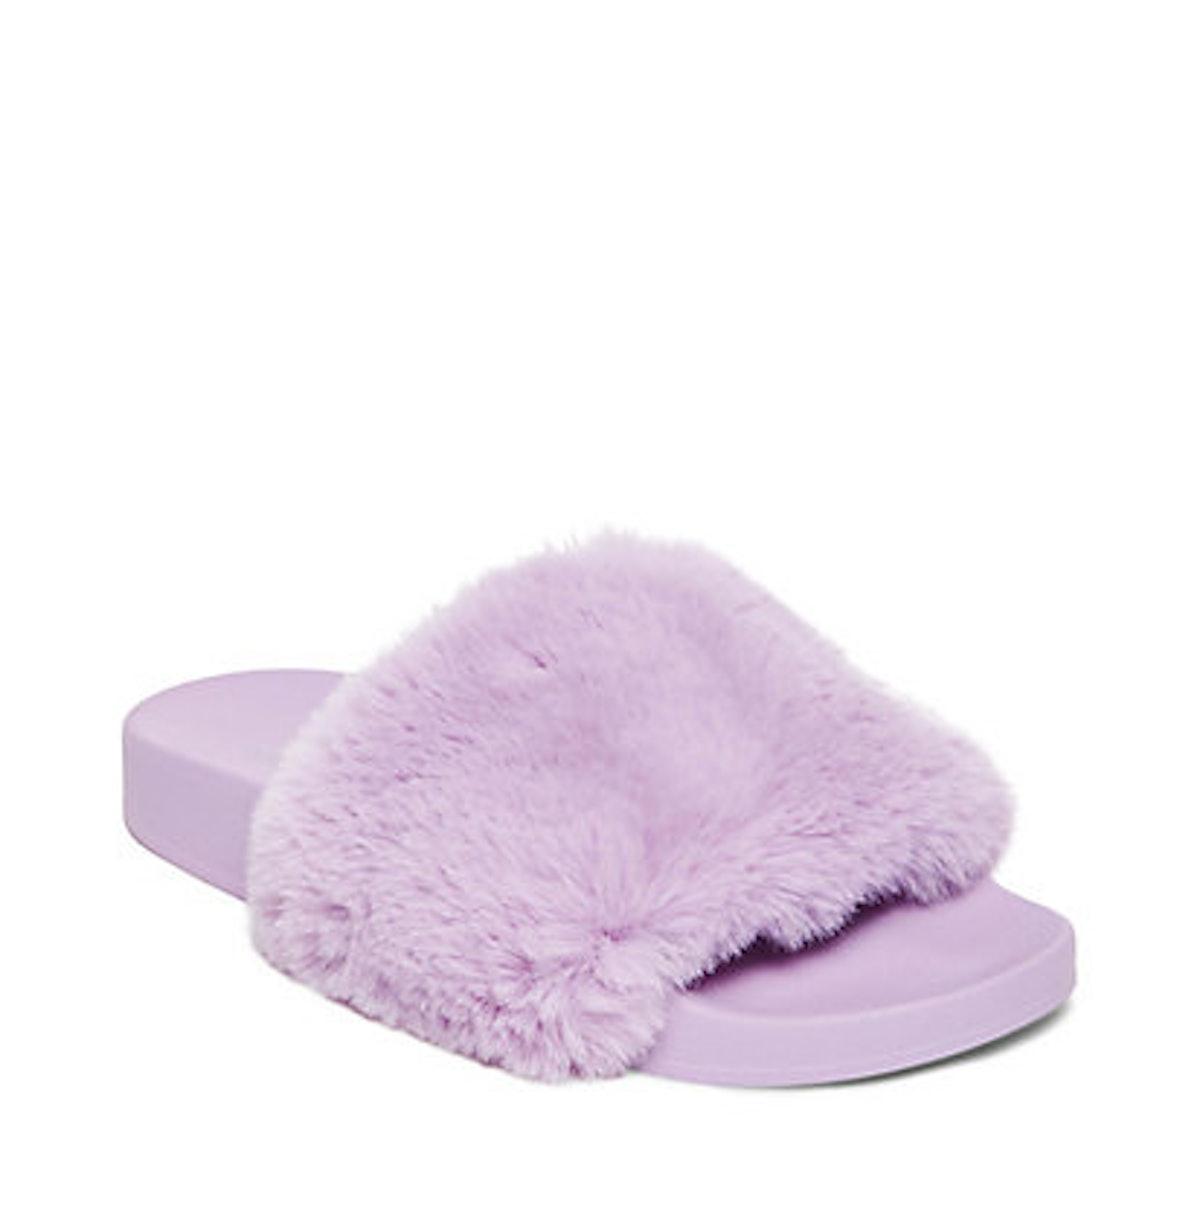 Softey Furry Slides